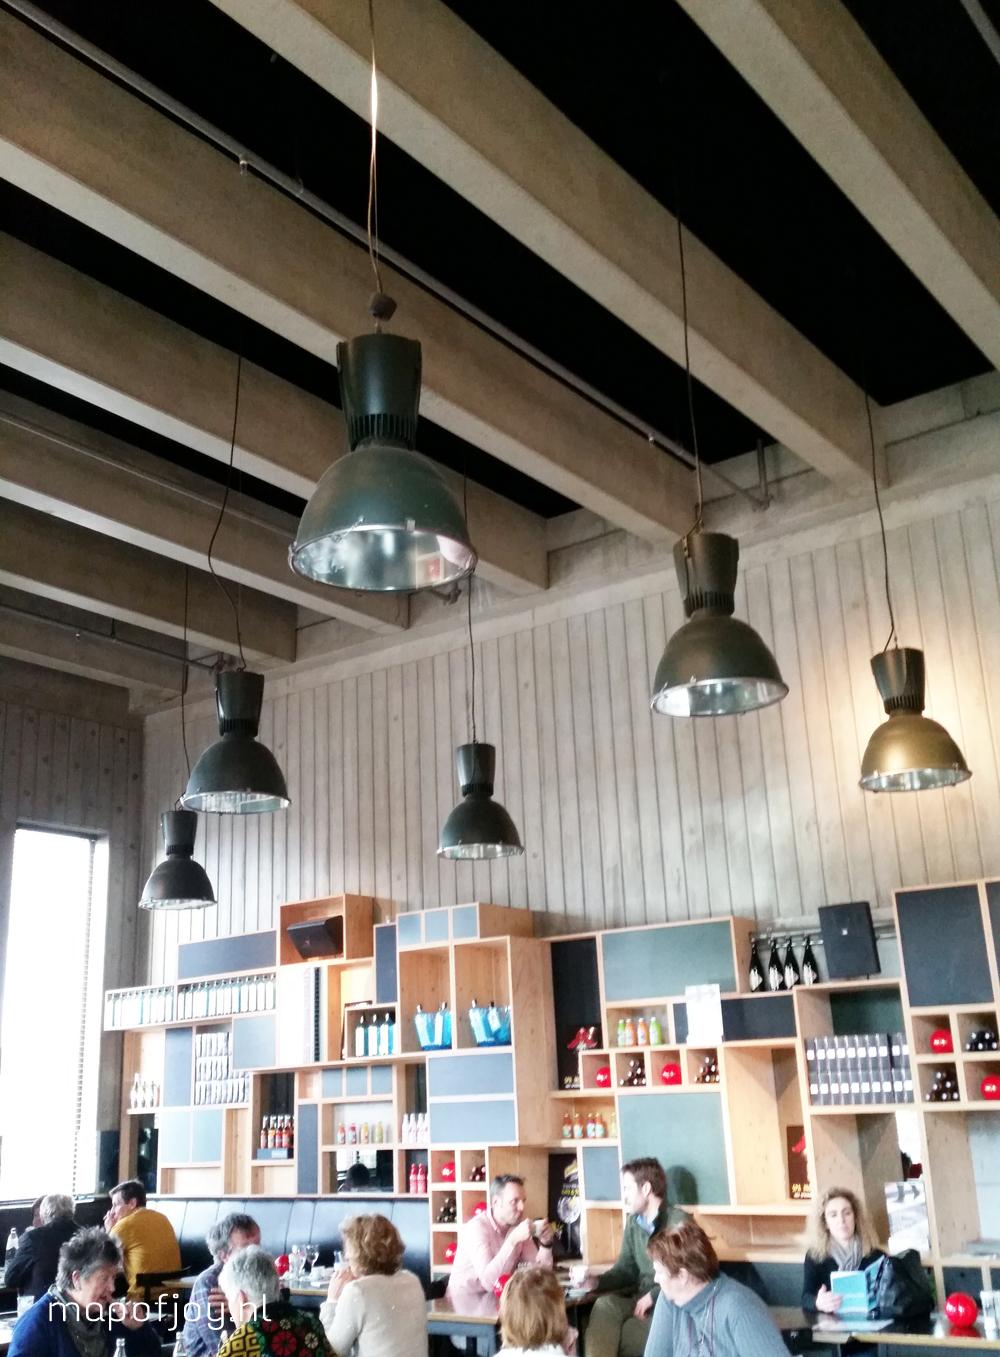 Café Storm, food hot spot Antwerpen - Map of Joy